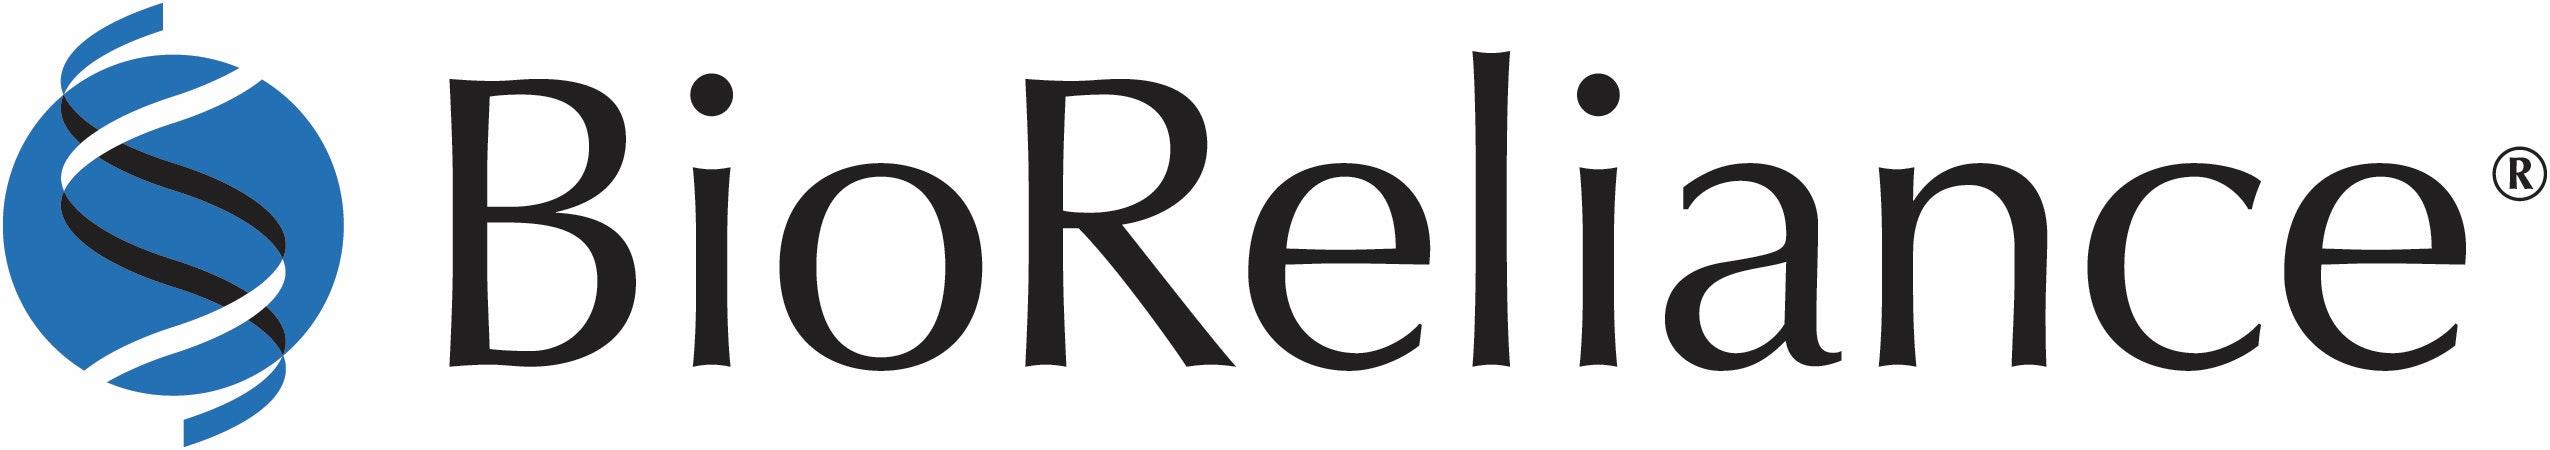 BioReliance Lab / Facility Logo